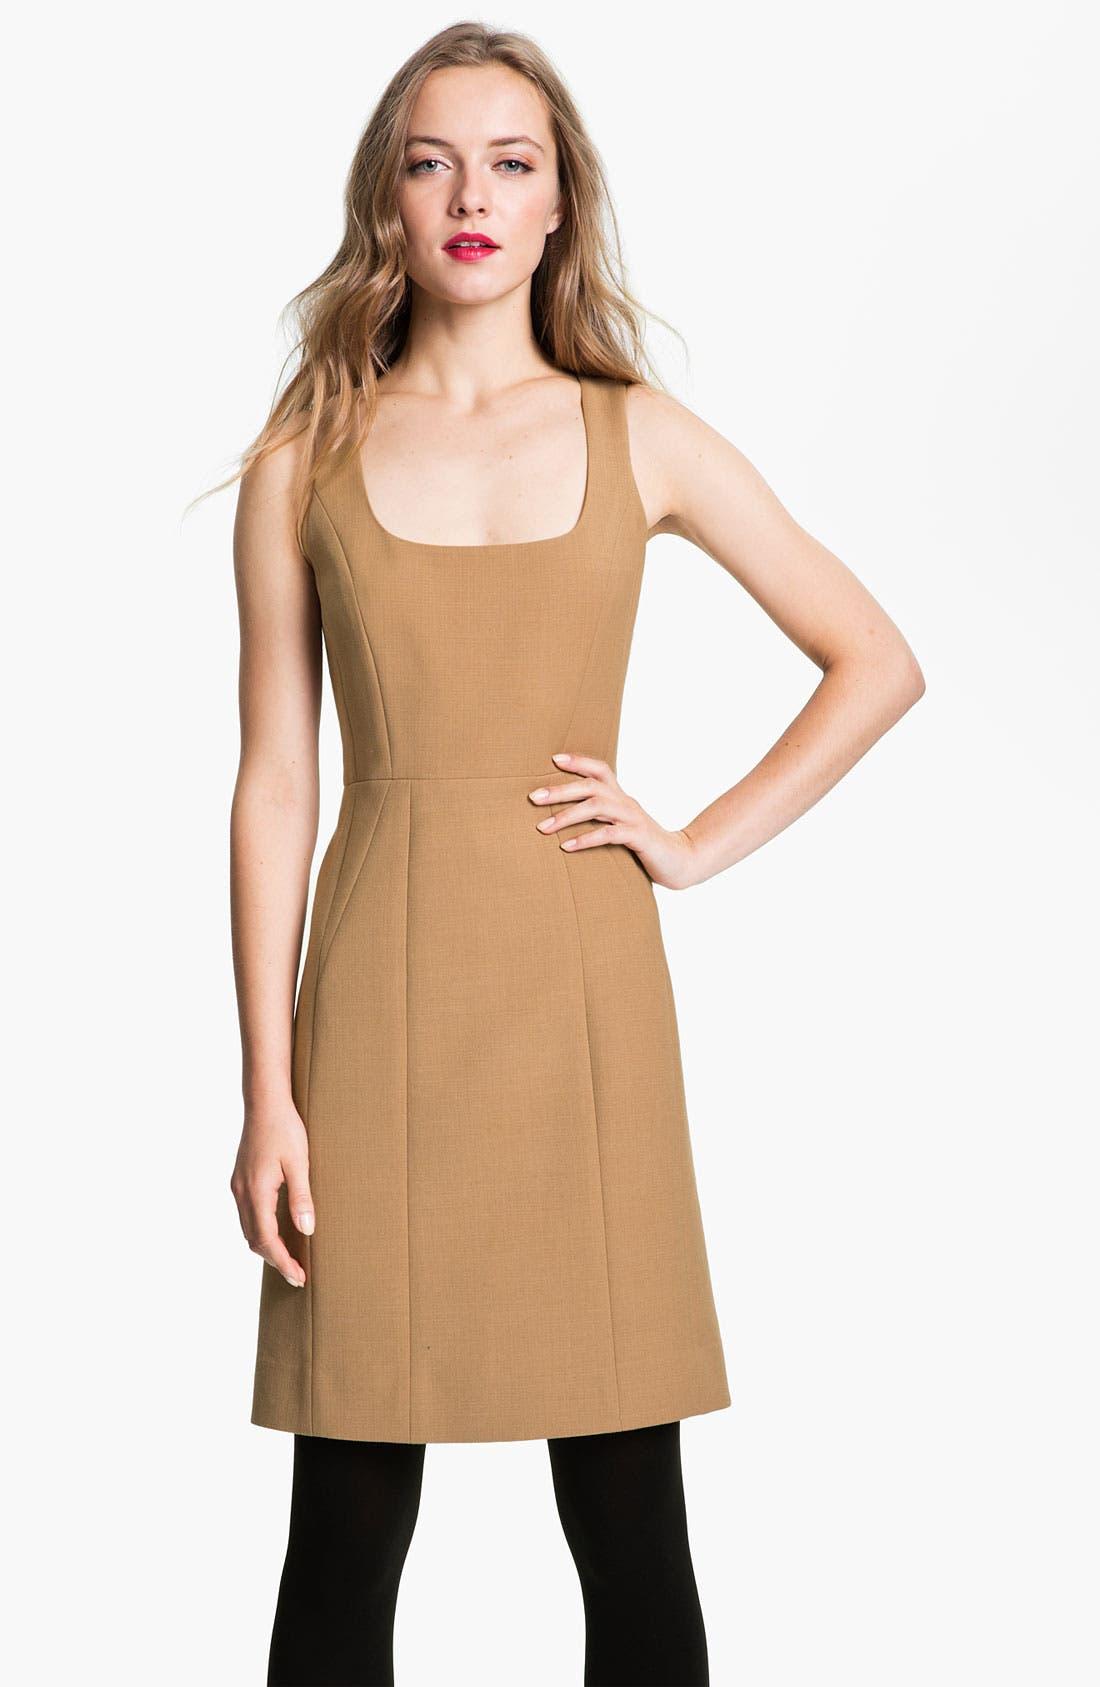 Alternate Image 1 Selected - Tory Burch 'Azalea' Stretch Wool Sheath Dress